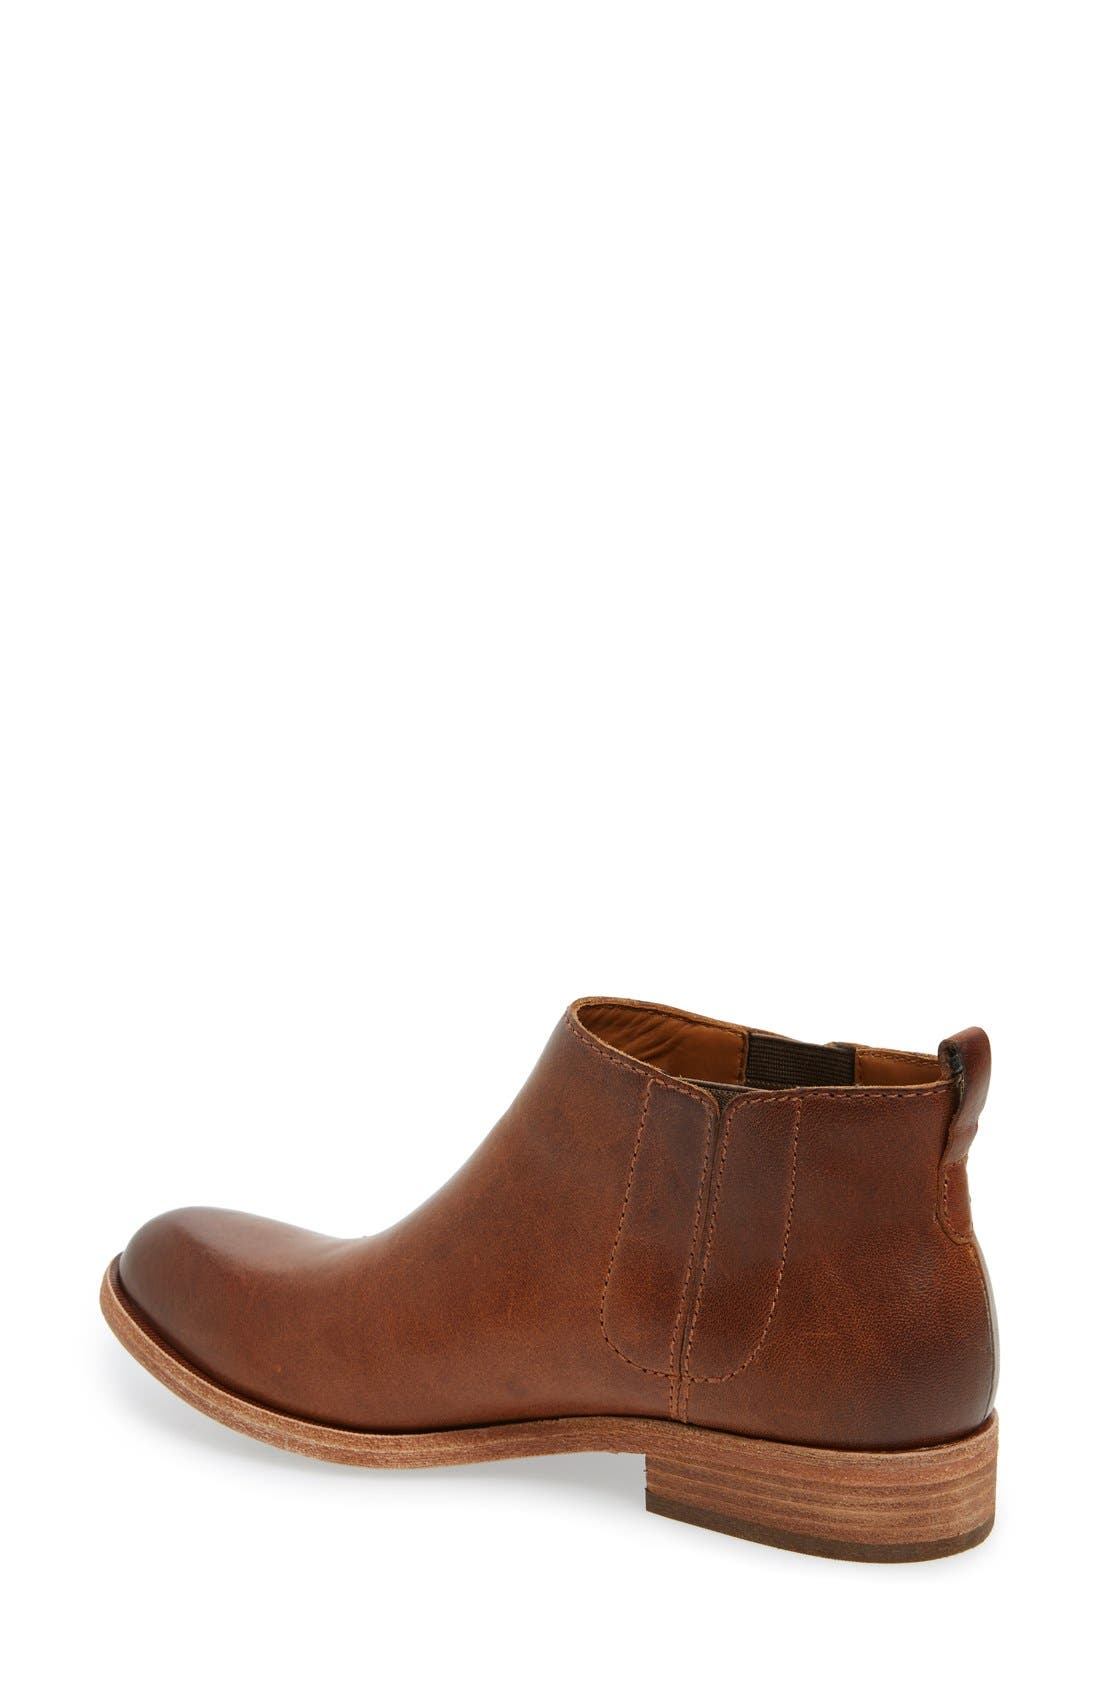 cdd4a4147b4 Kork-Ease® Shoes